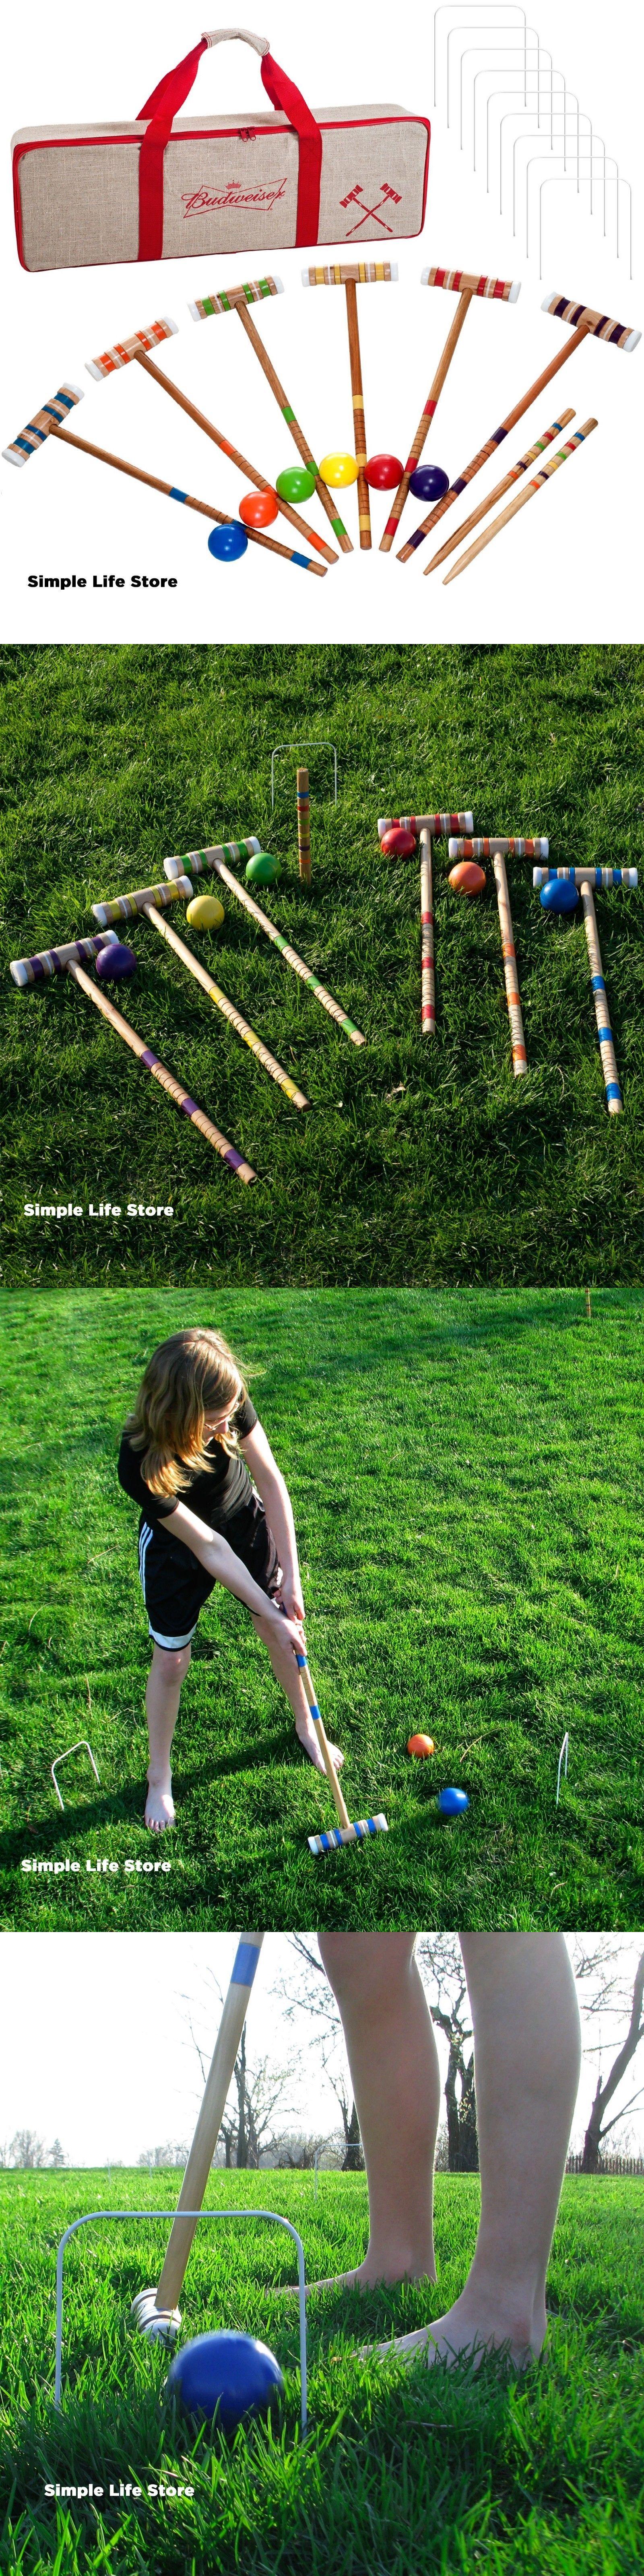 croquet 117210 wooden 24 piece backyard croquet lawn game set